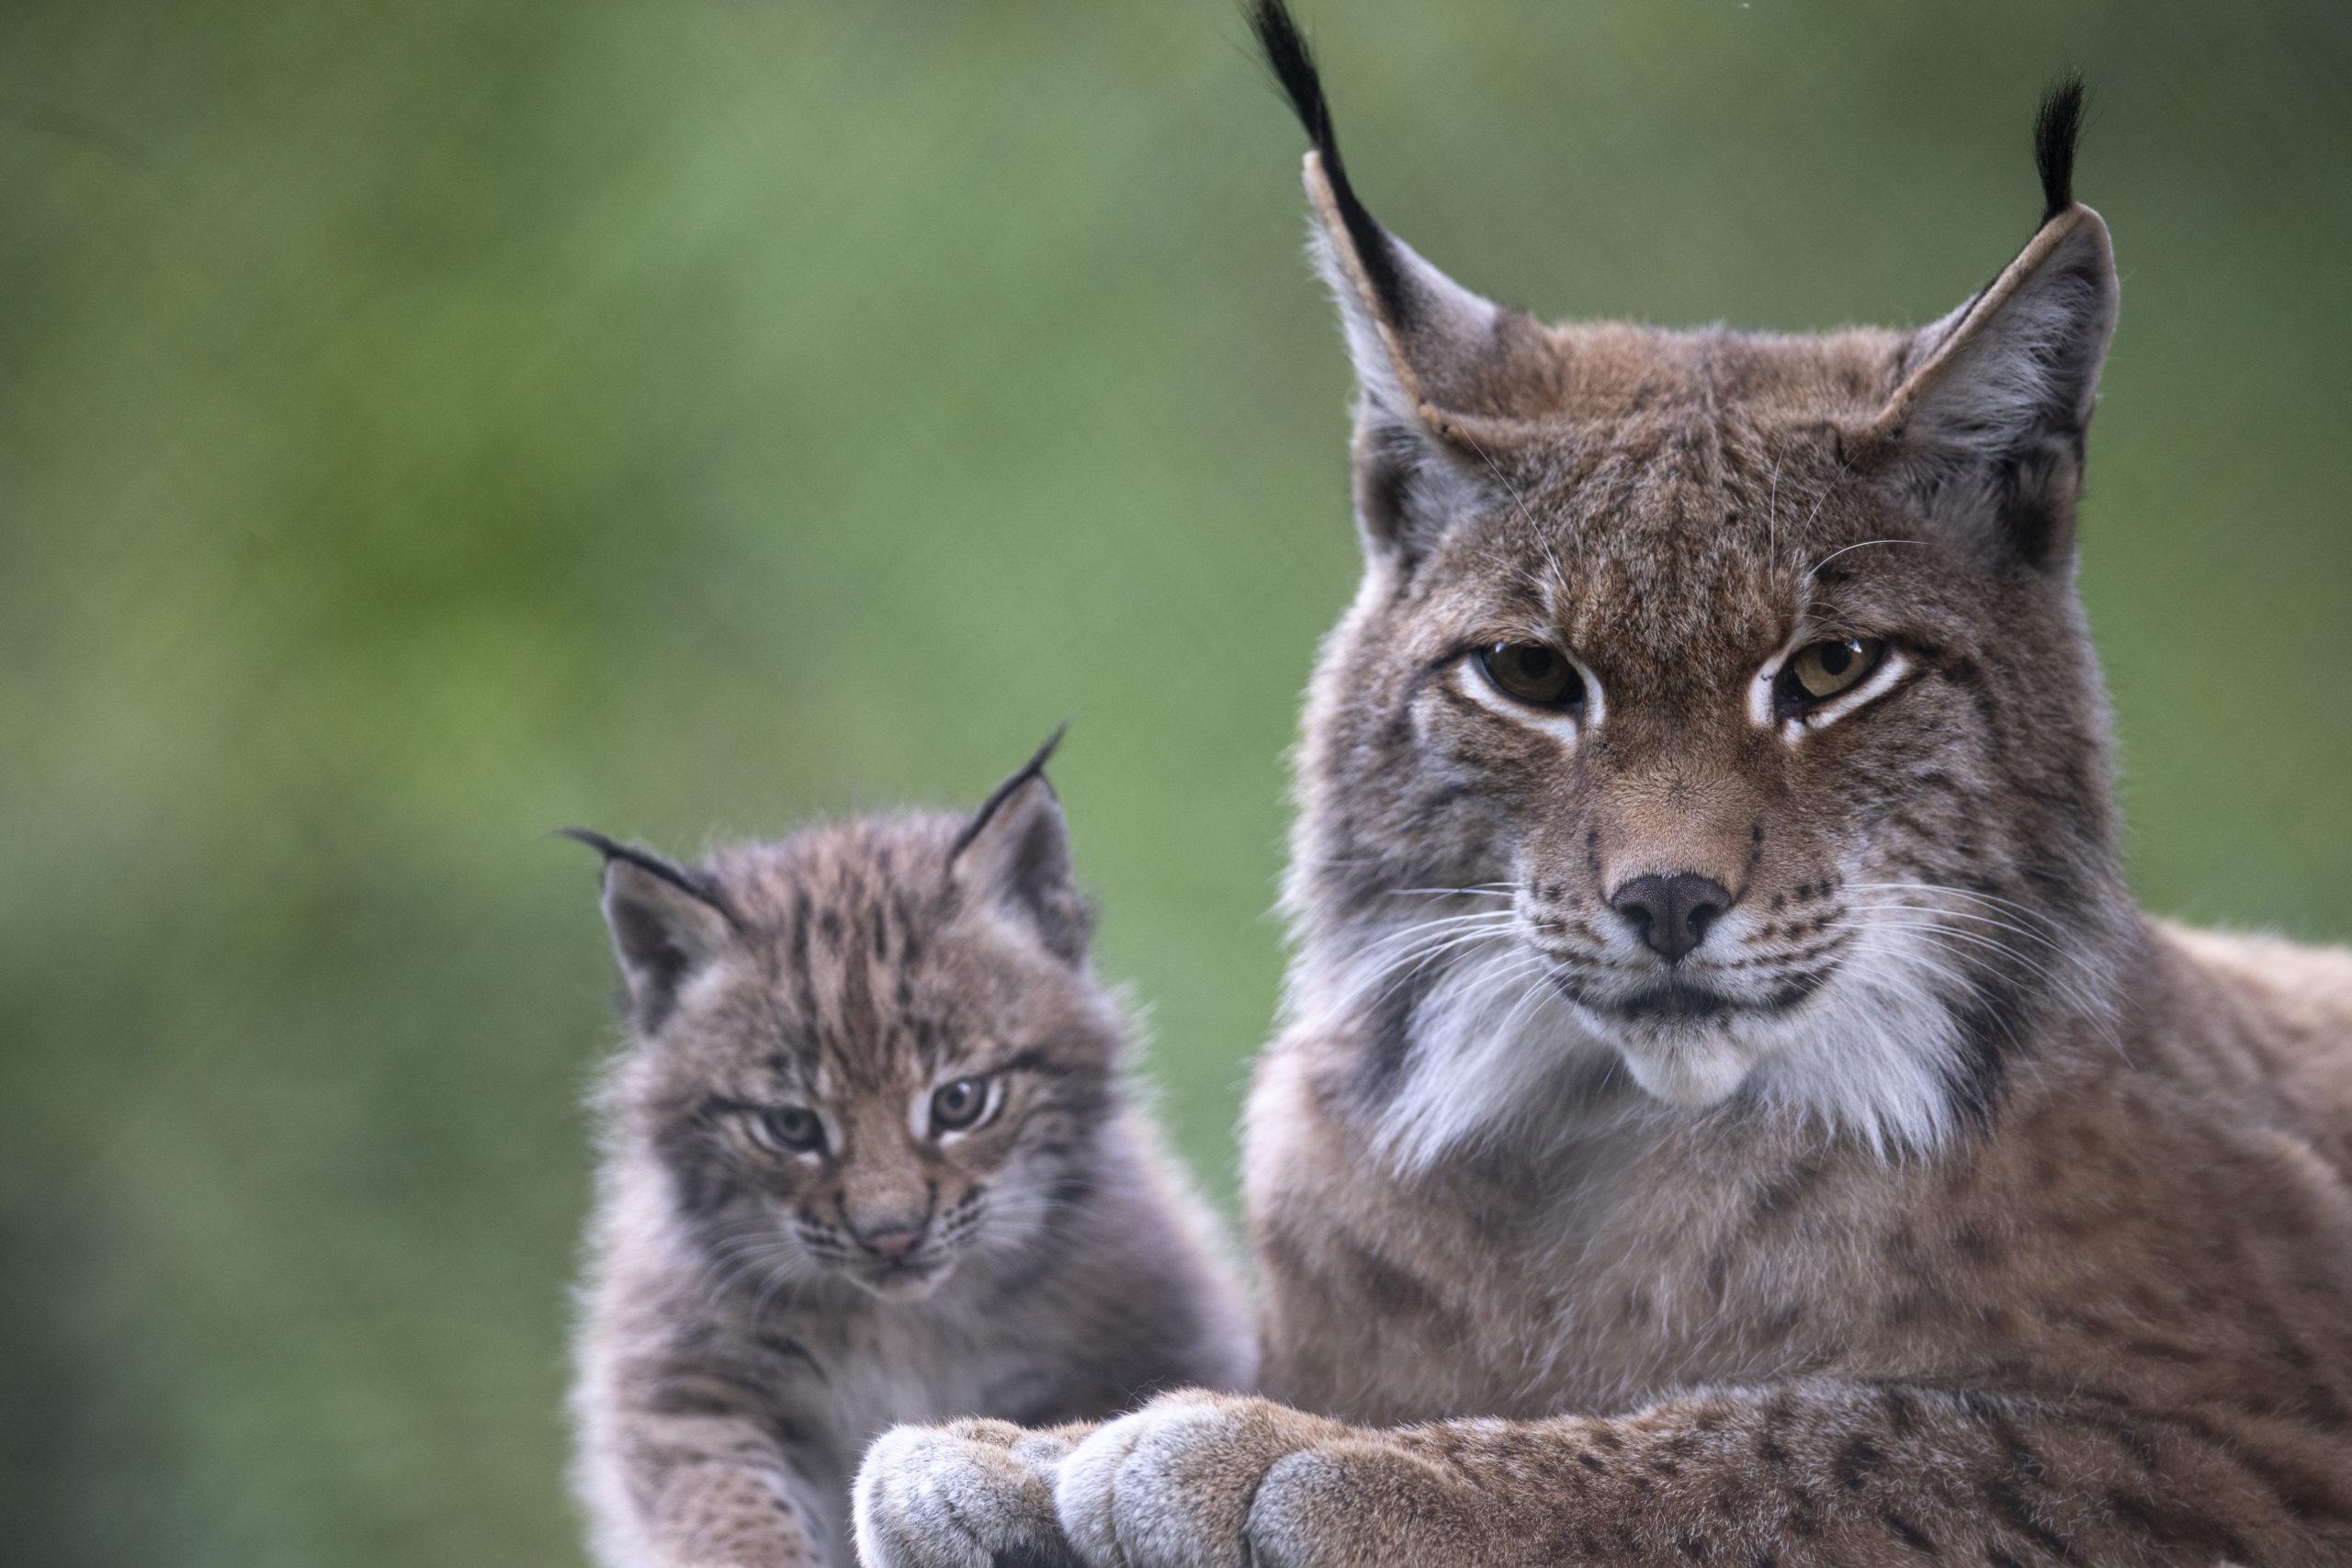 c Daniel Schwab - Naturfotografie Besuchermagneten im Wildpark.